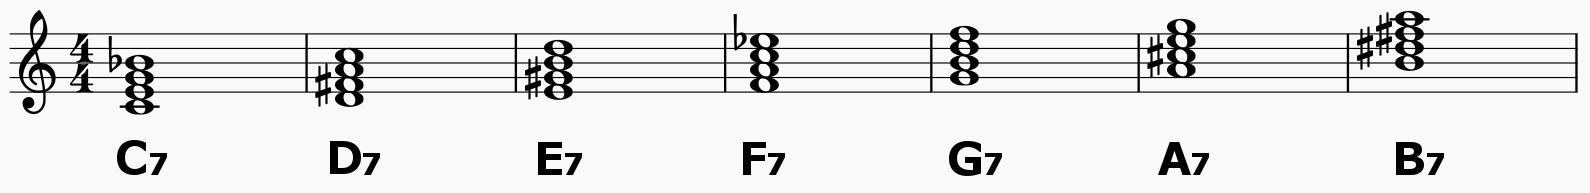 chordname_7